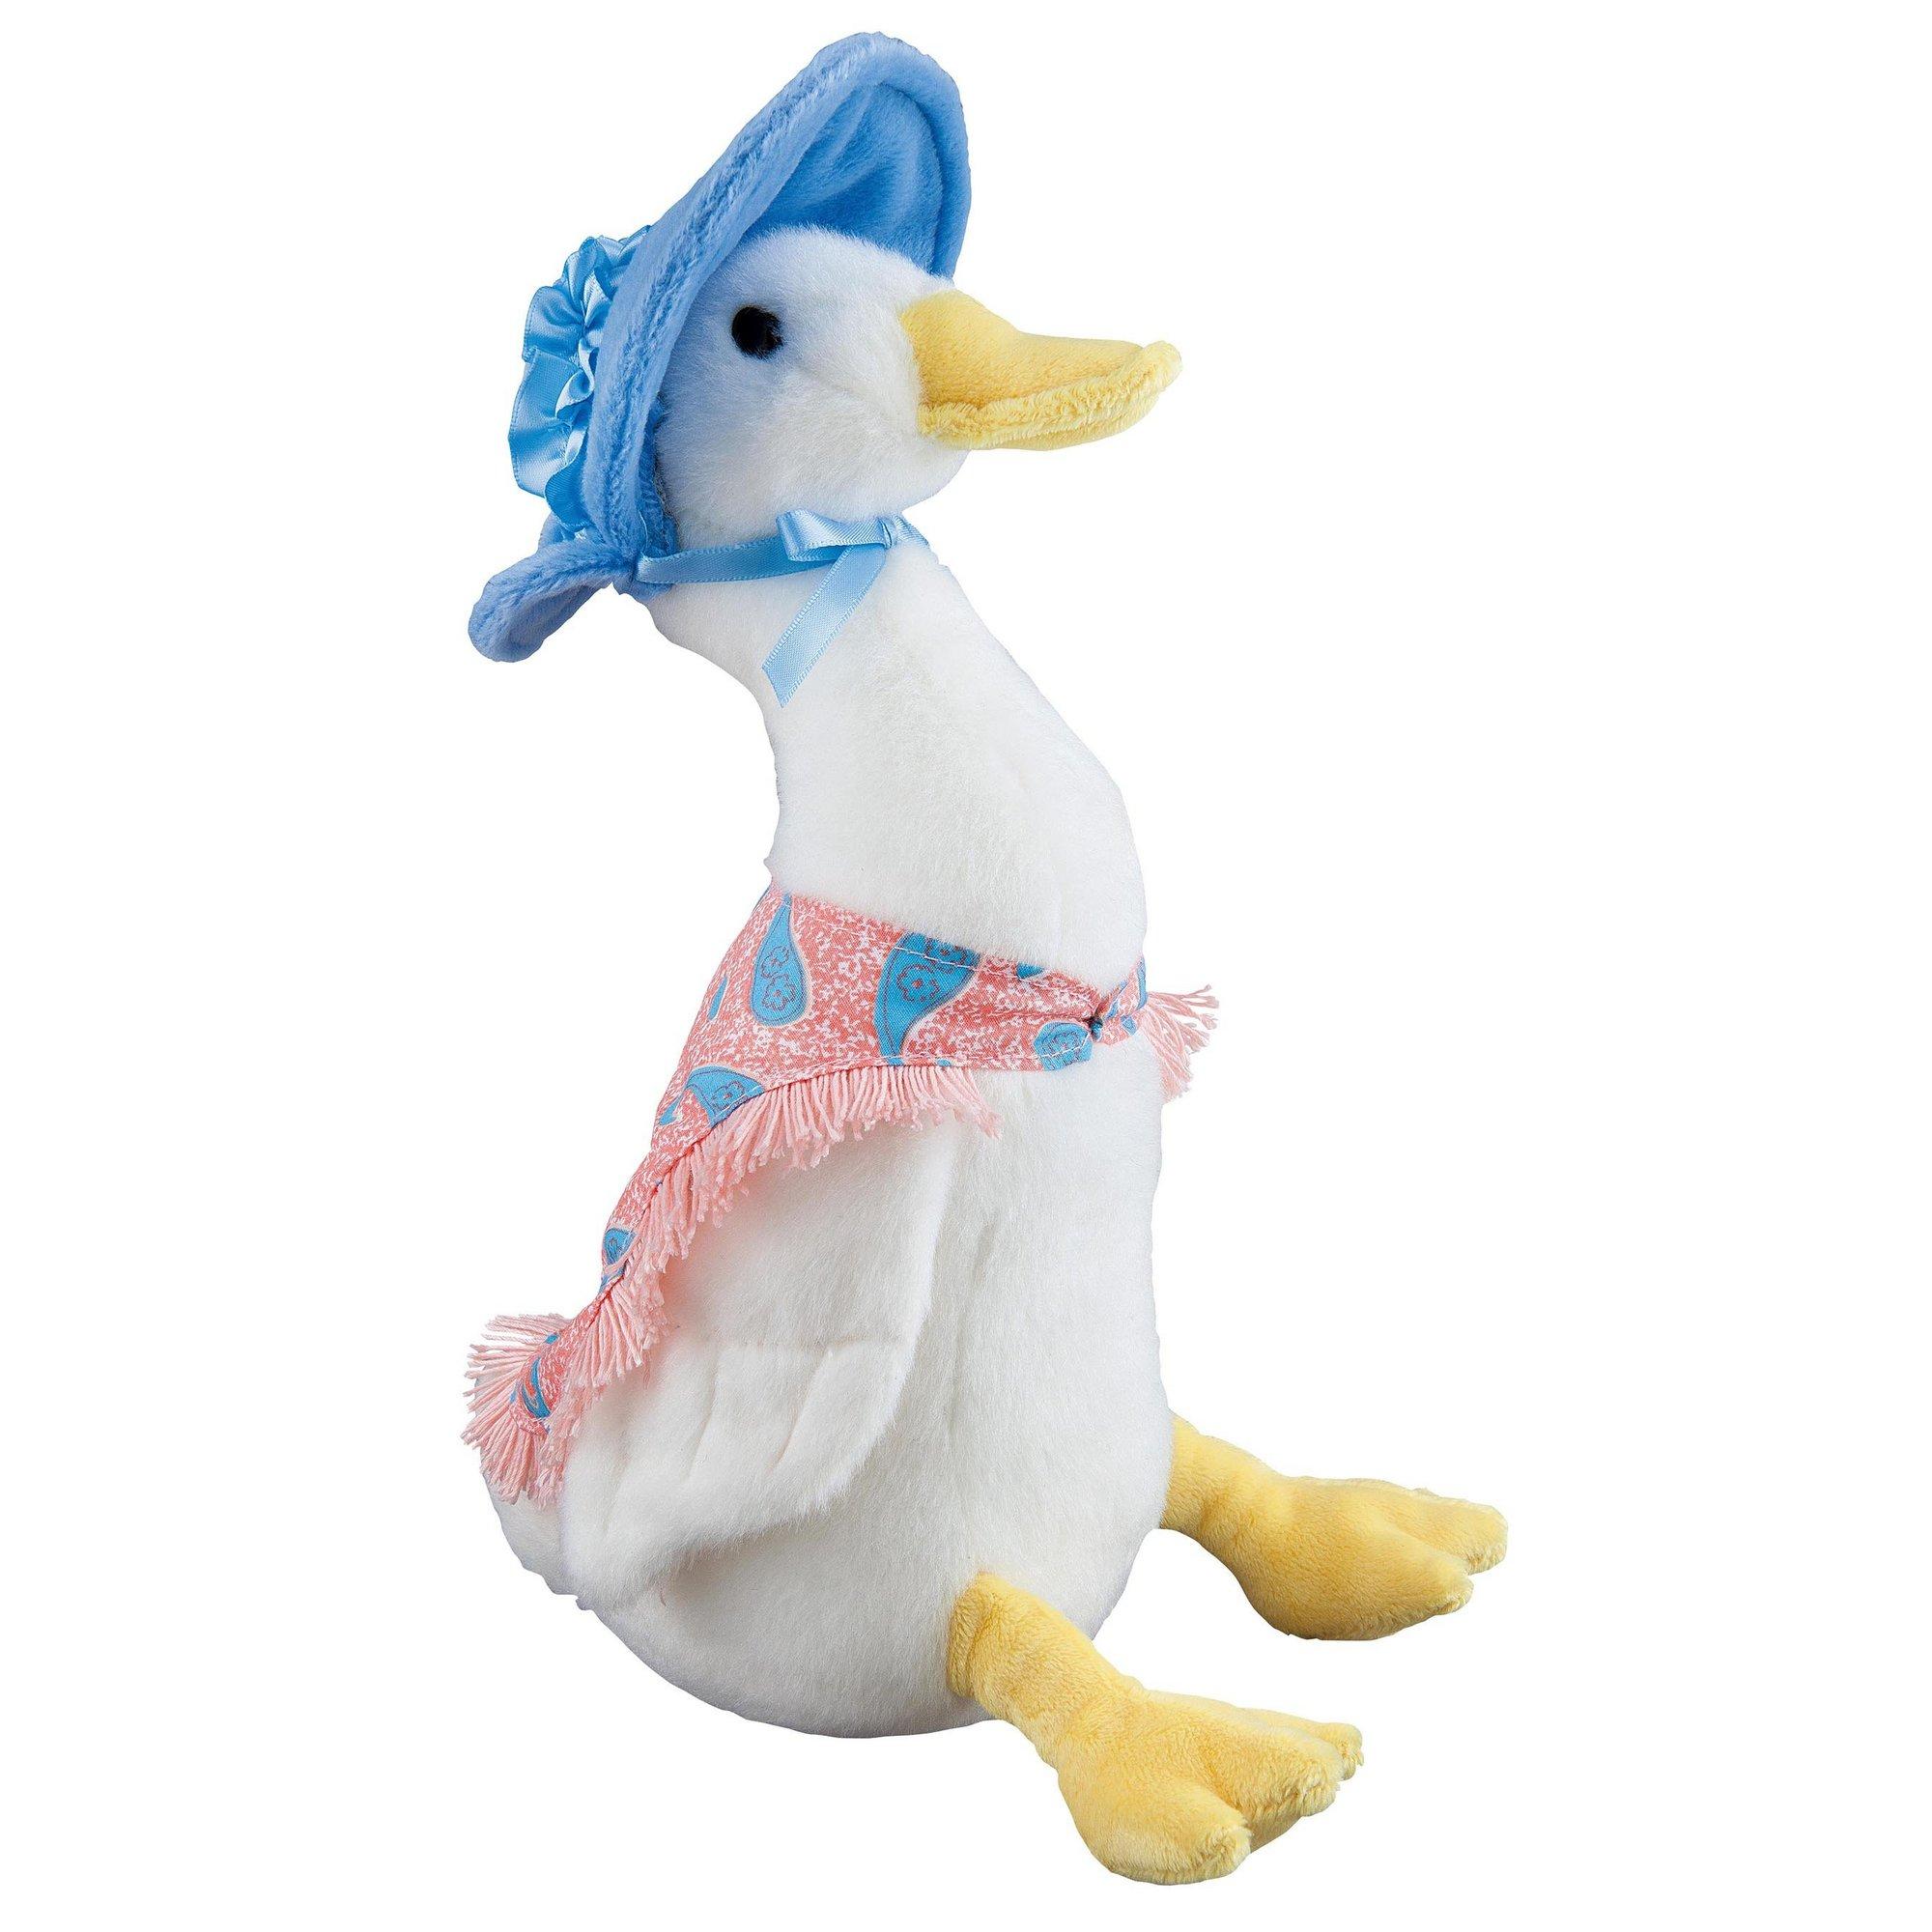 Image of Beatrix Potter Jemima Puddle Duck Large